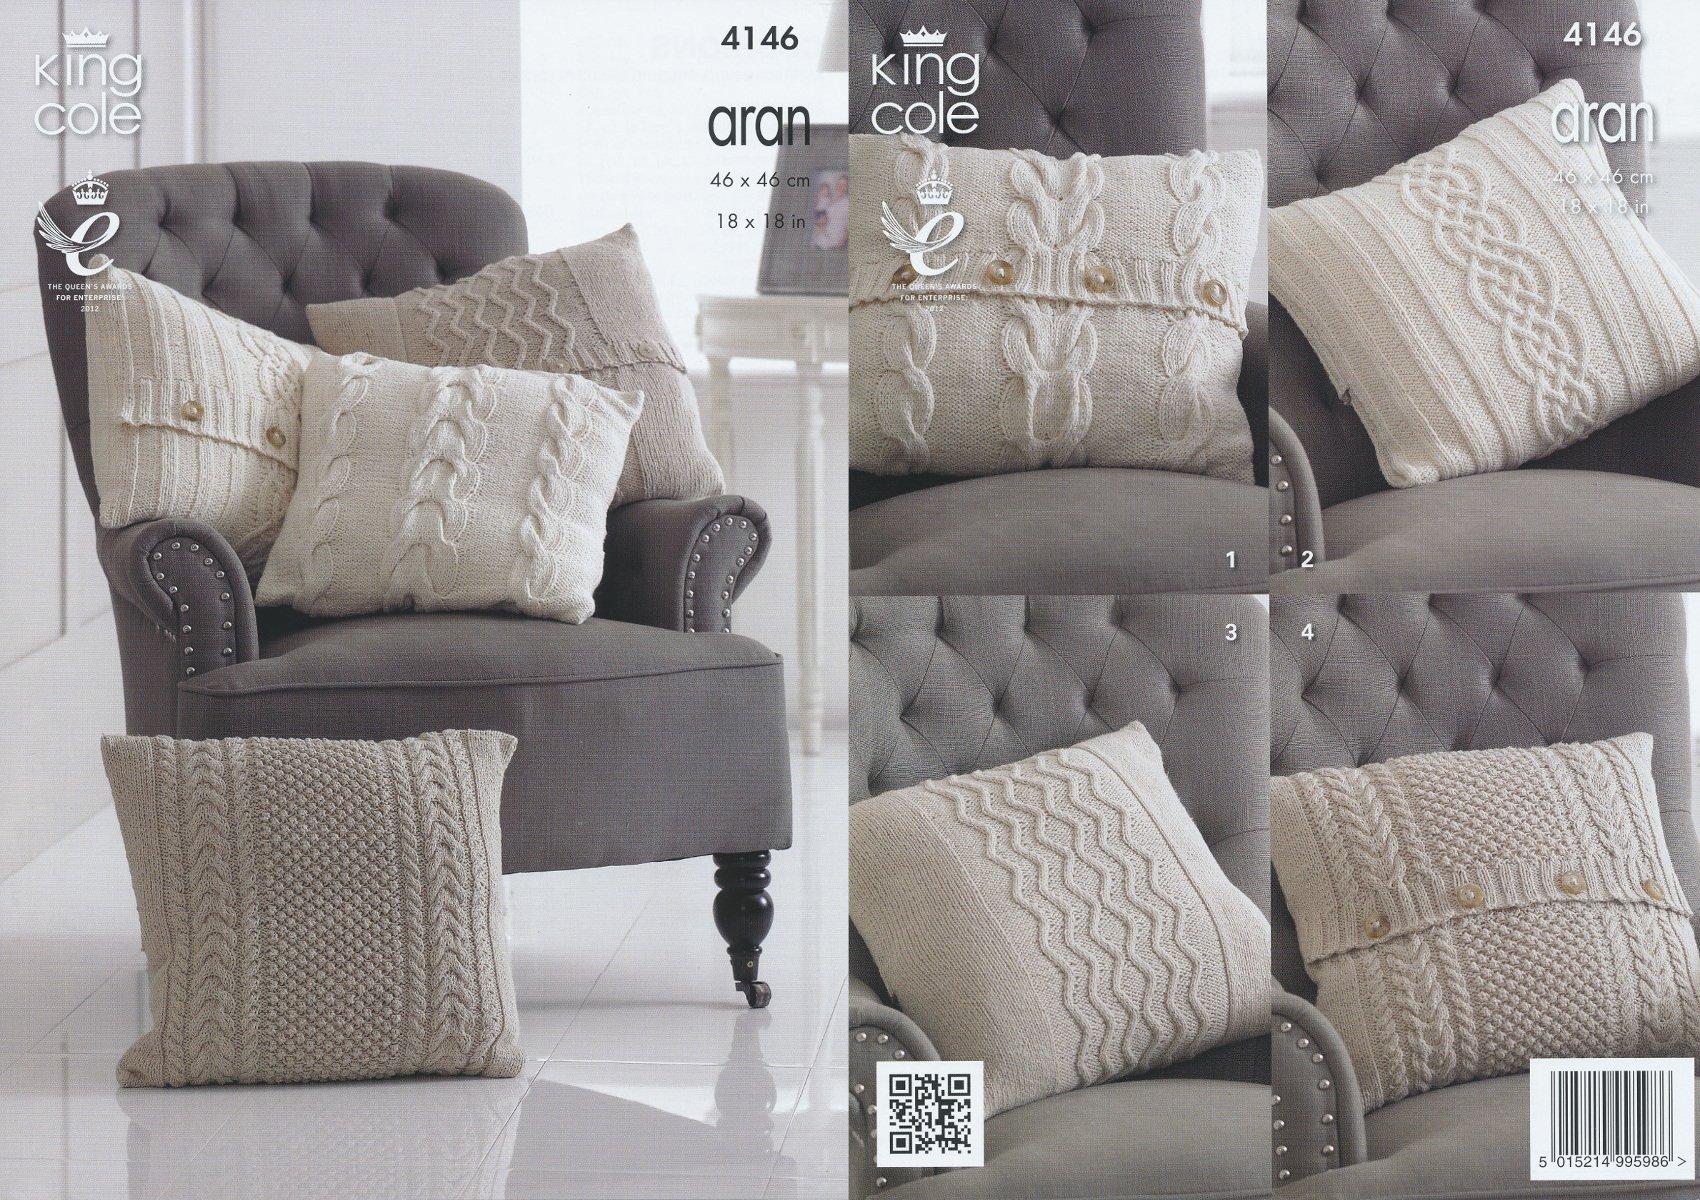 Knitting Patterns for Cushions: Amazon.co.uk